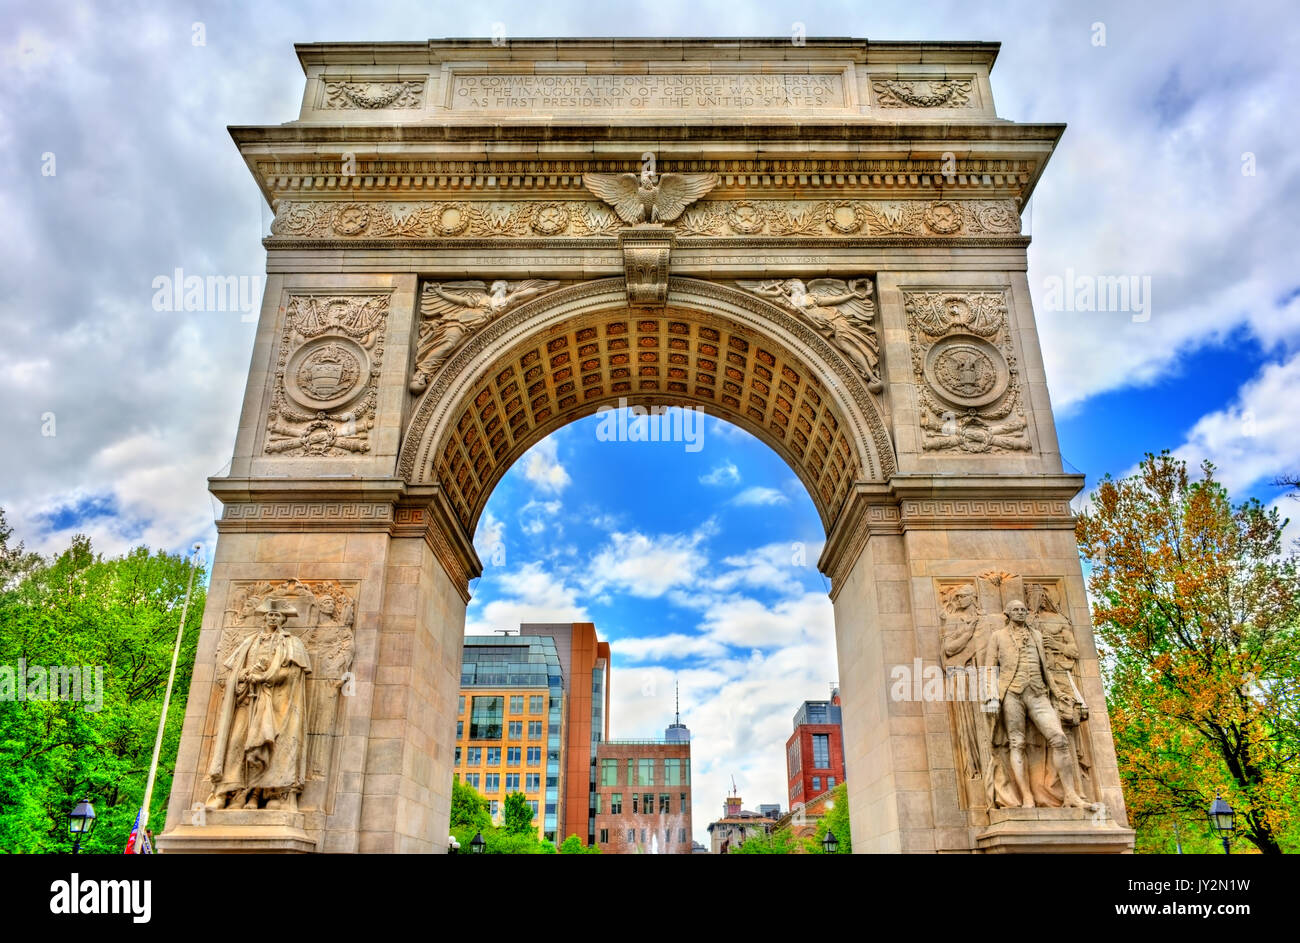 Washington Square Arch, un marmo arco trionfale a Manhattan, New York City Immagini Stock